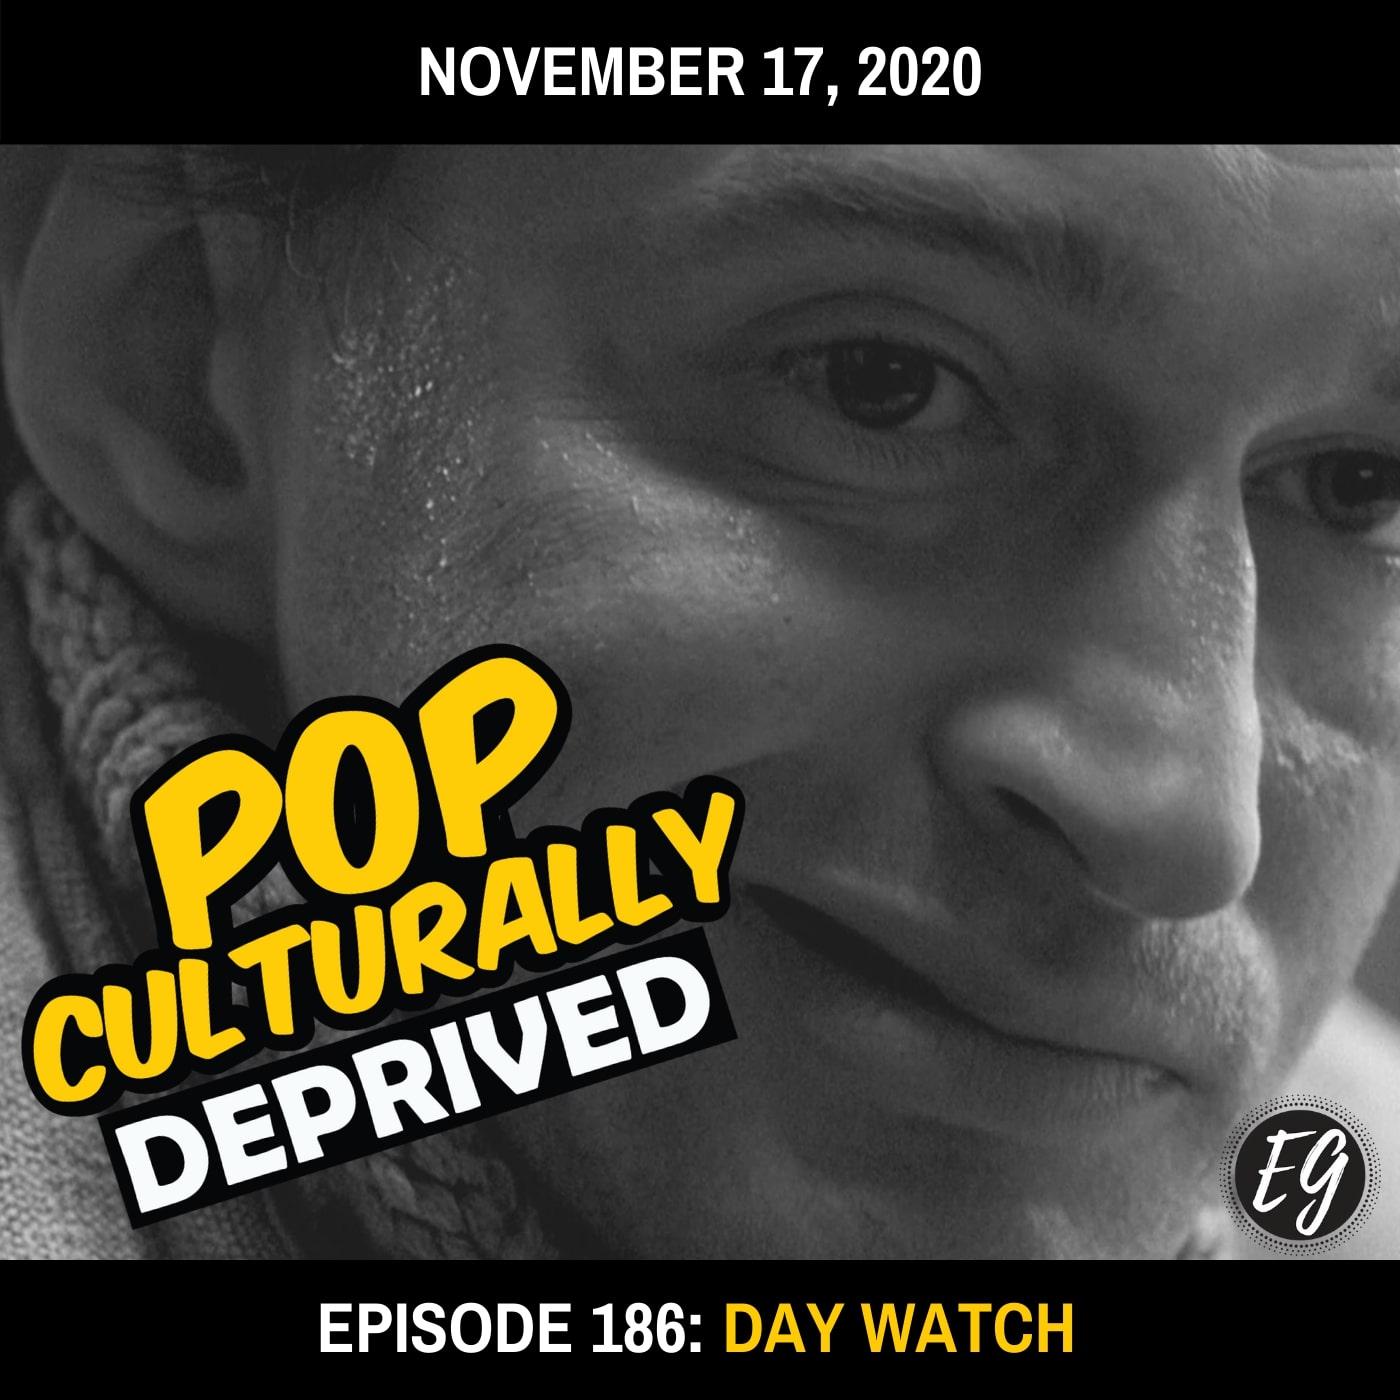 Episode 186: Day Watch